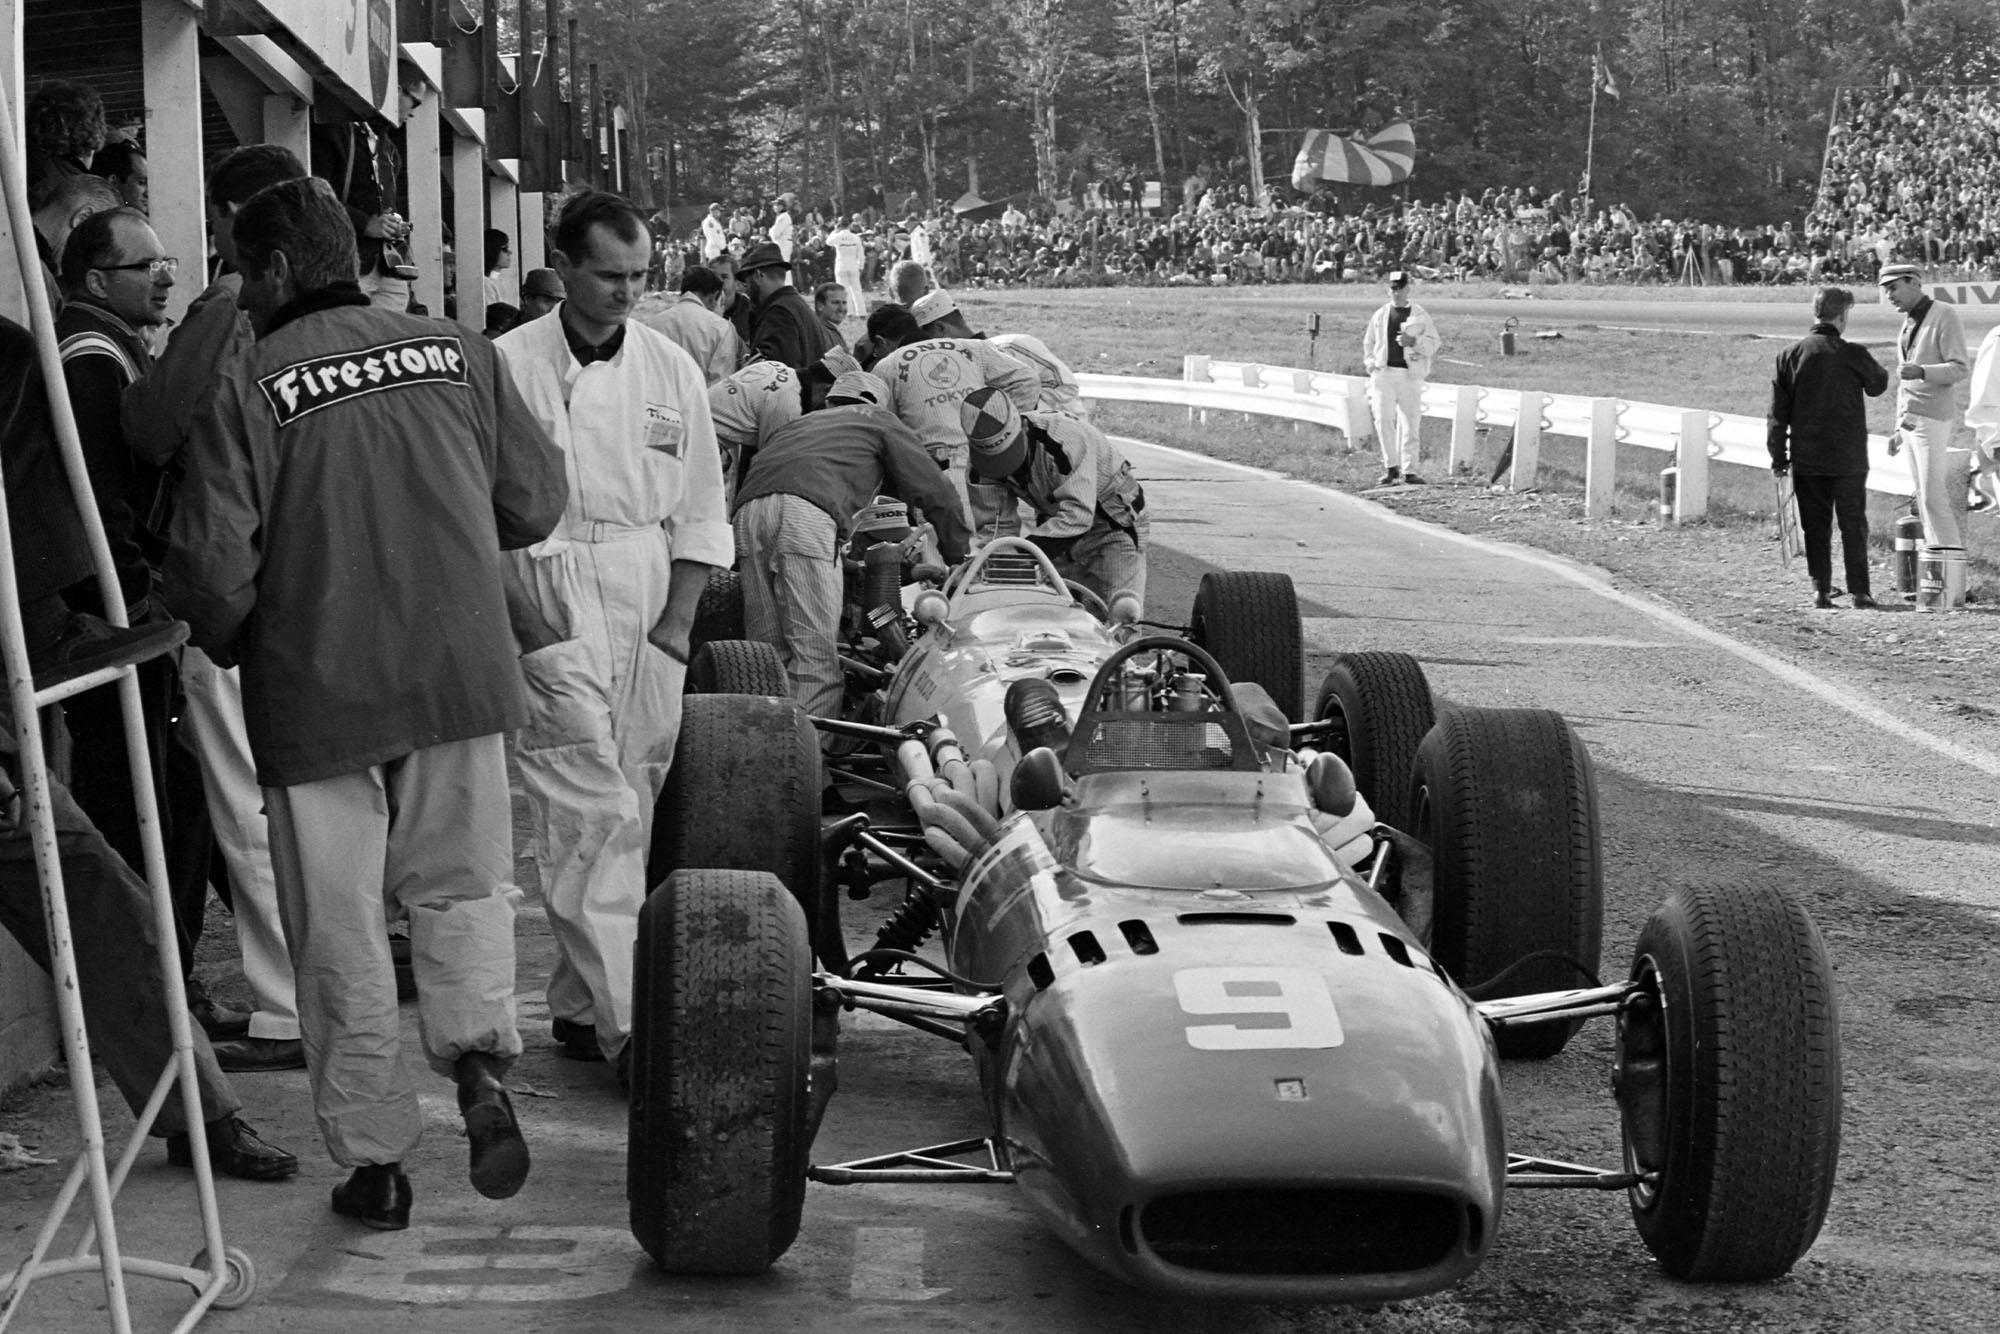 Lorenzo Bandini's Ferrari 312 in the pit lane.